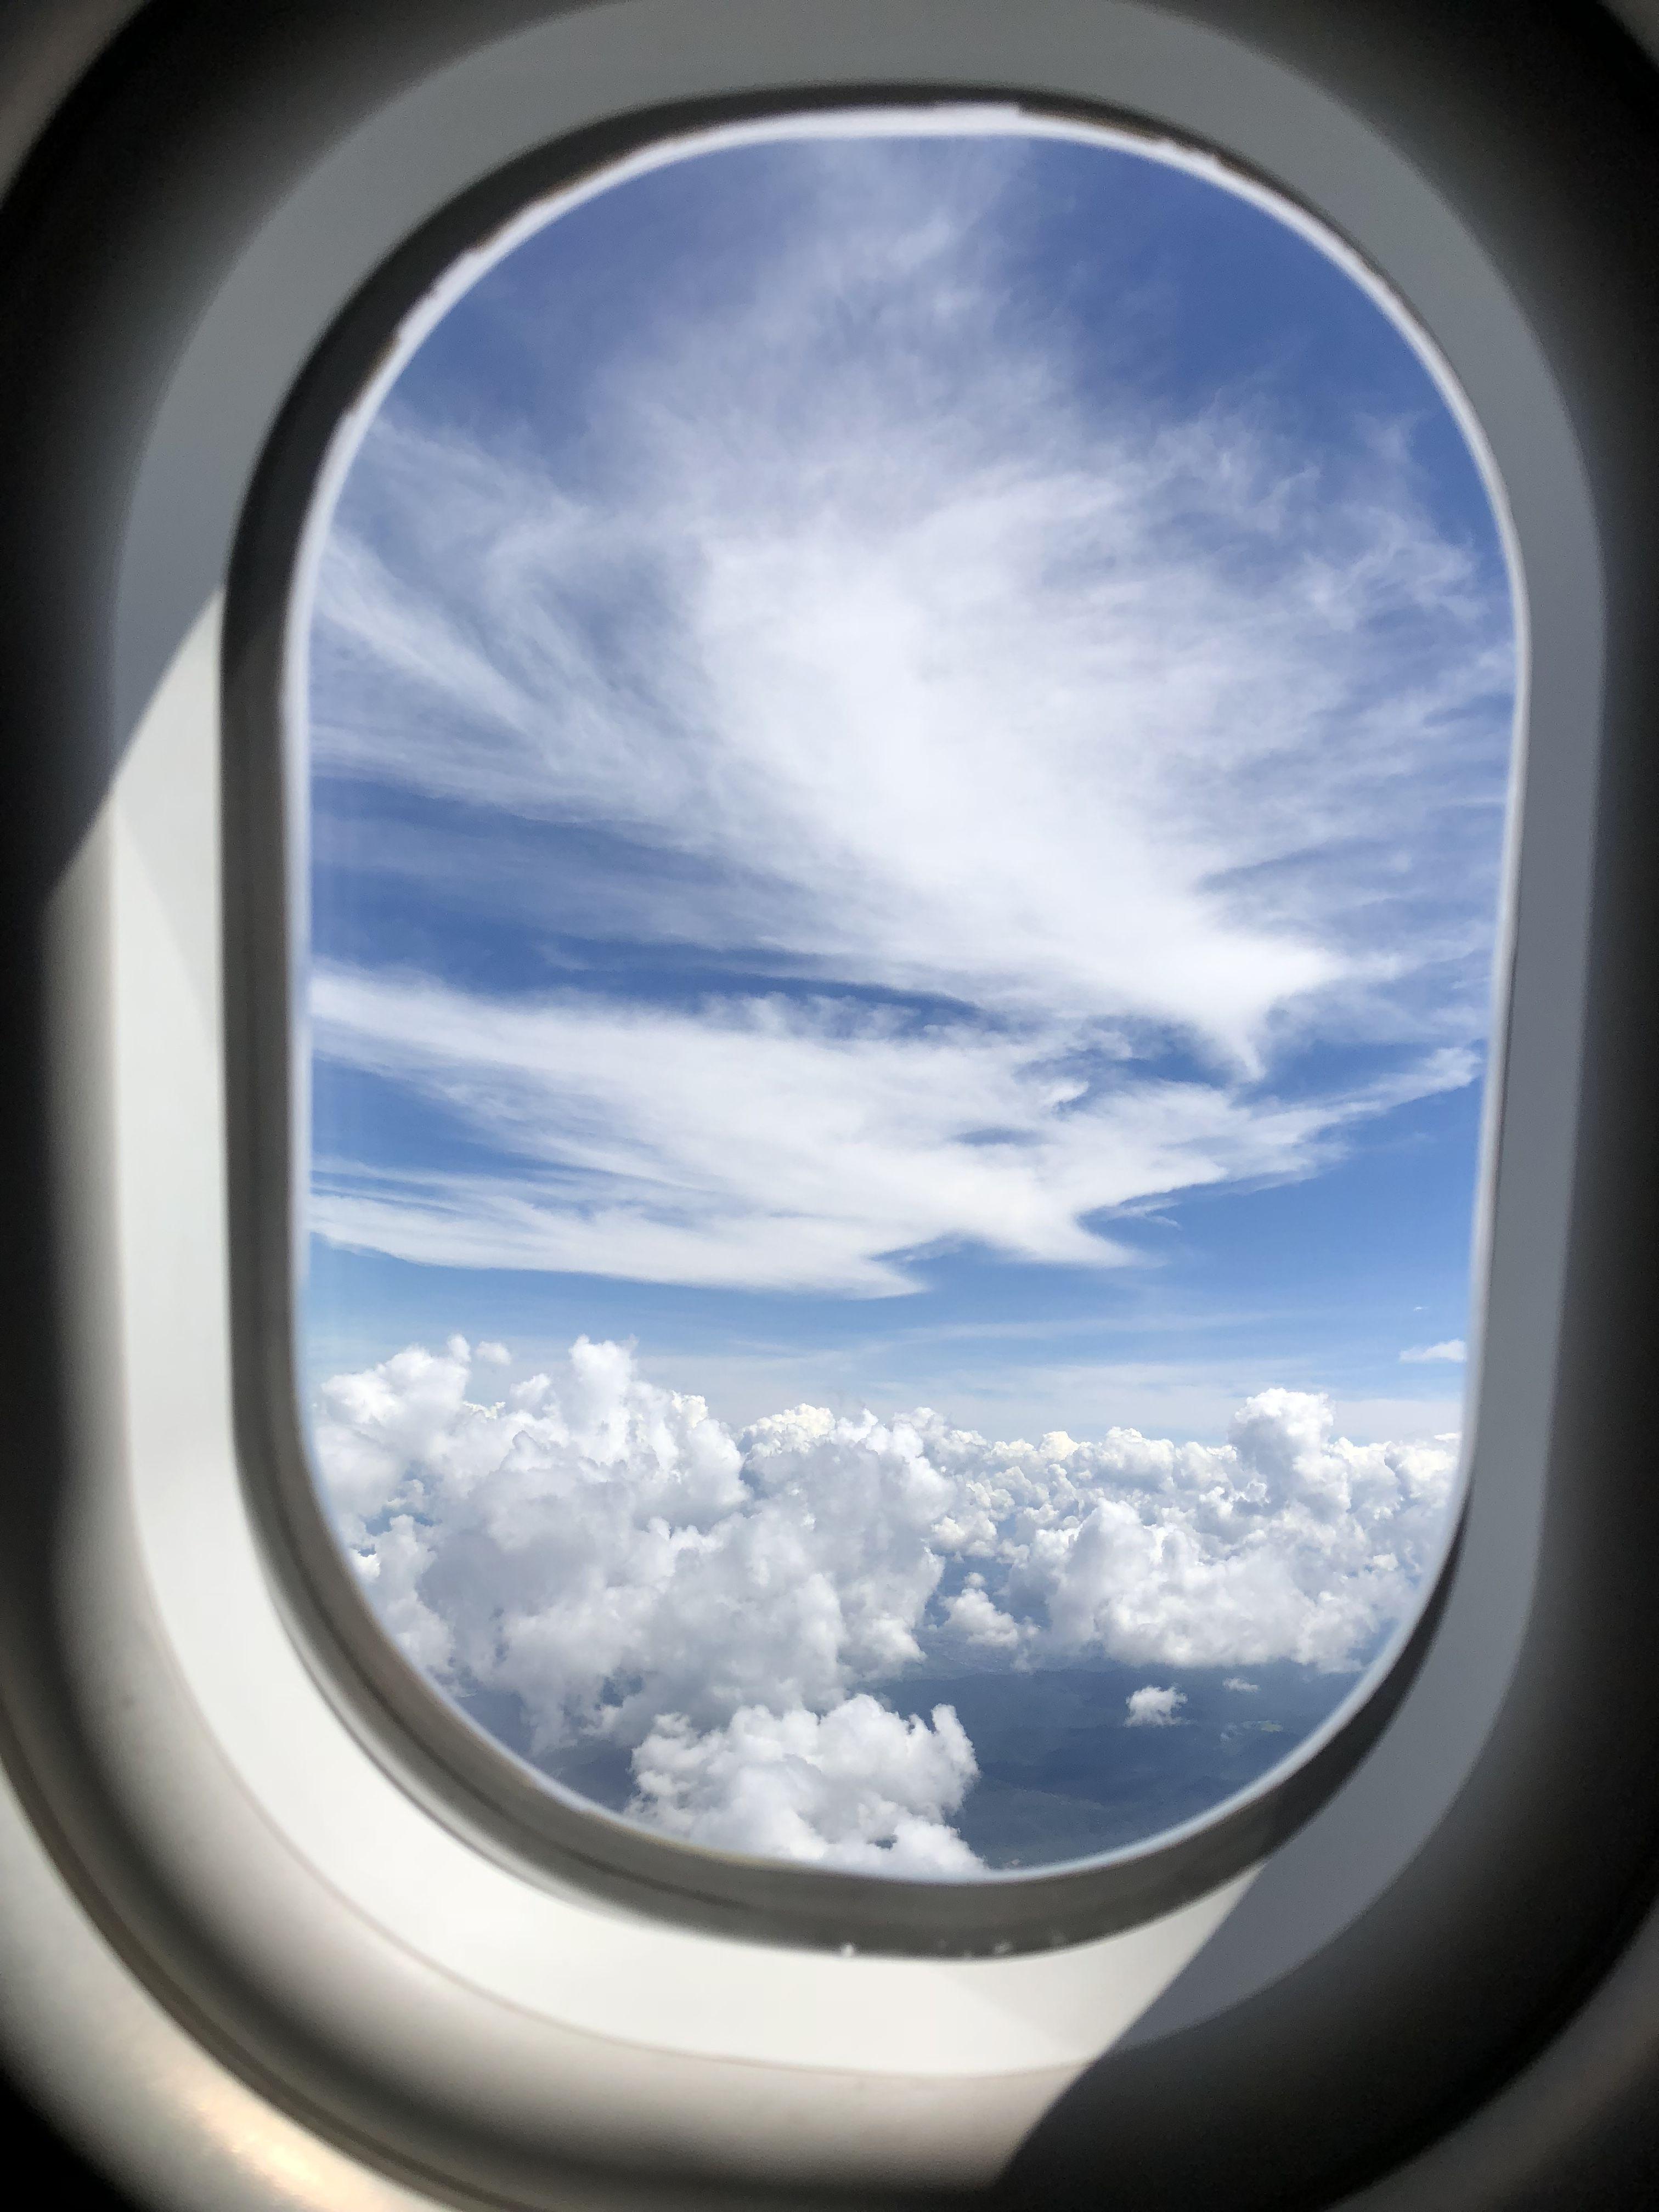 Pin By Koichi Nakahara On Plane Windows Airplane Window View